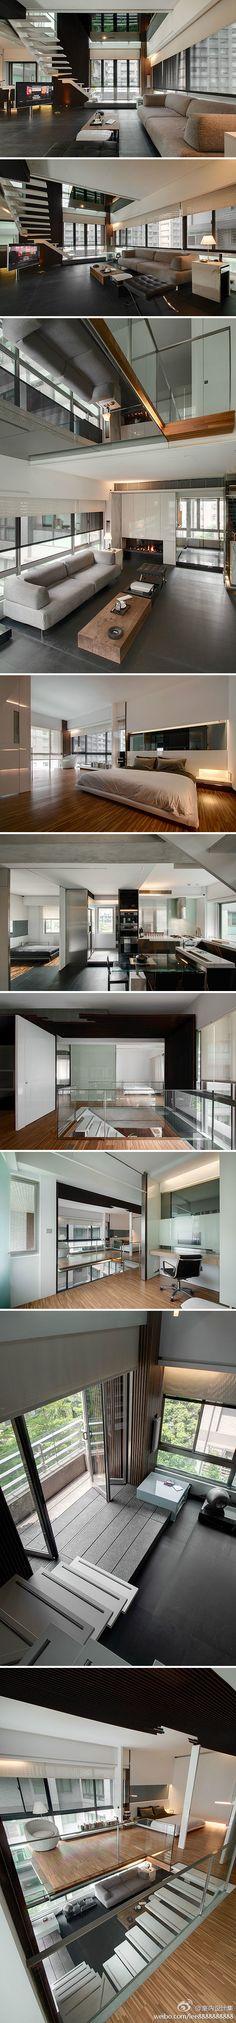 A modern duplex flat in Taipei - by TBDC